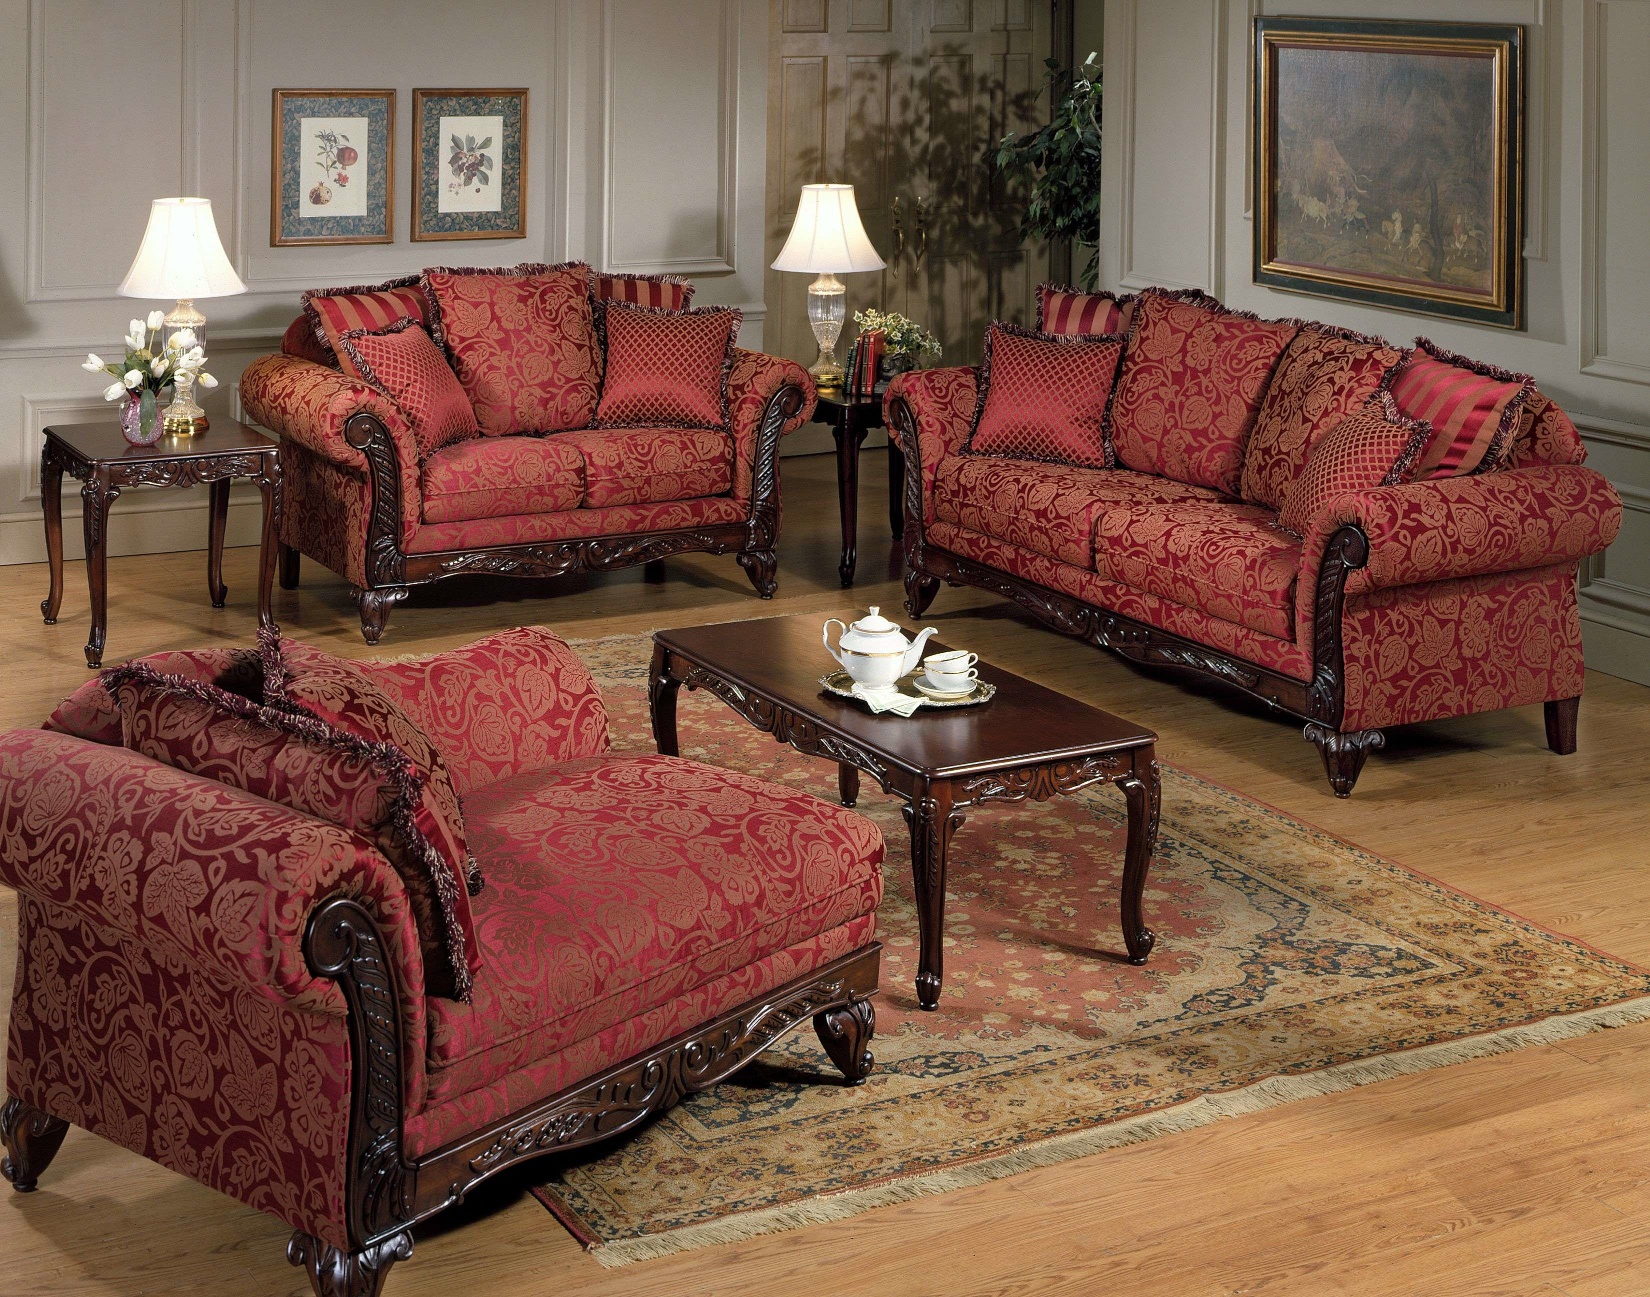 Union Furniture living room sofa loveseat red